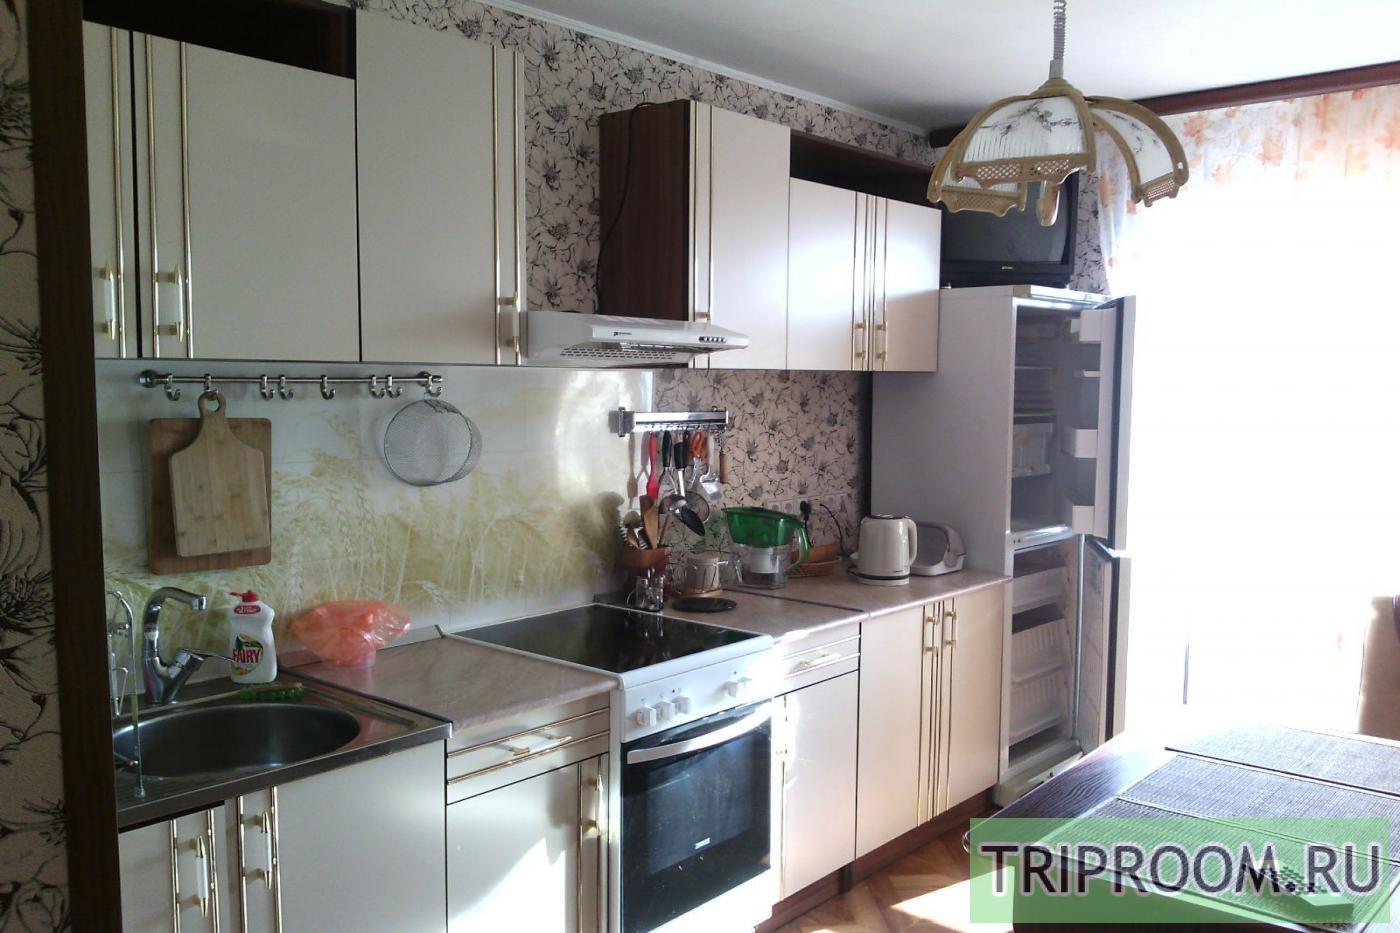 2-комнатная квартира посуточно (вариант № 33661), ул. Морозова Павла Леонтьевича, фото № 2